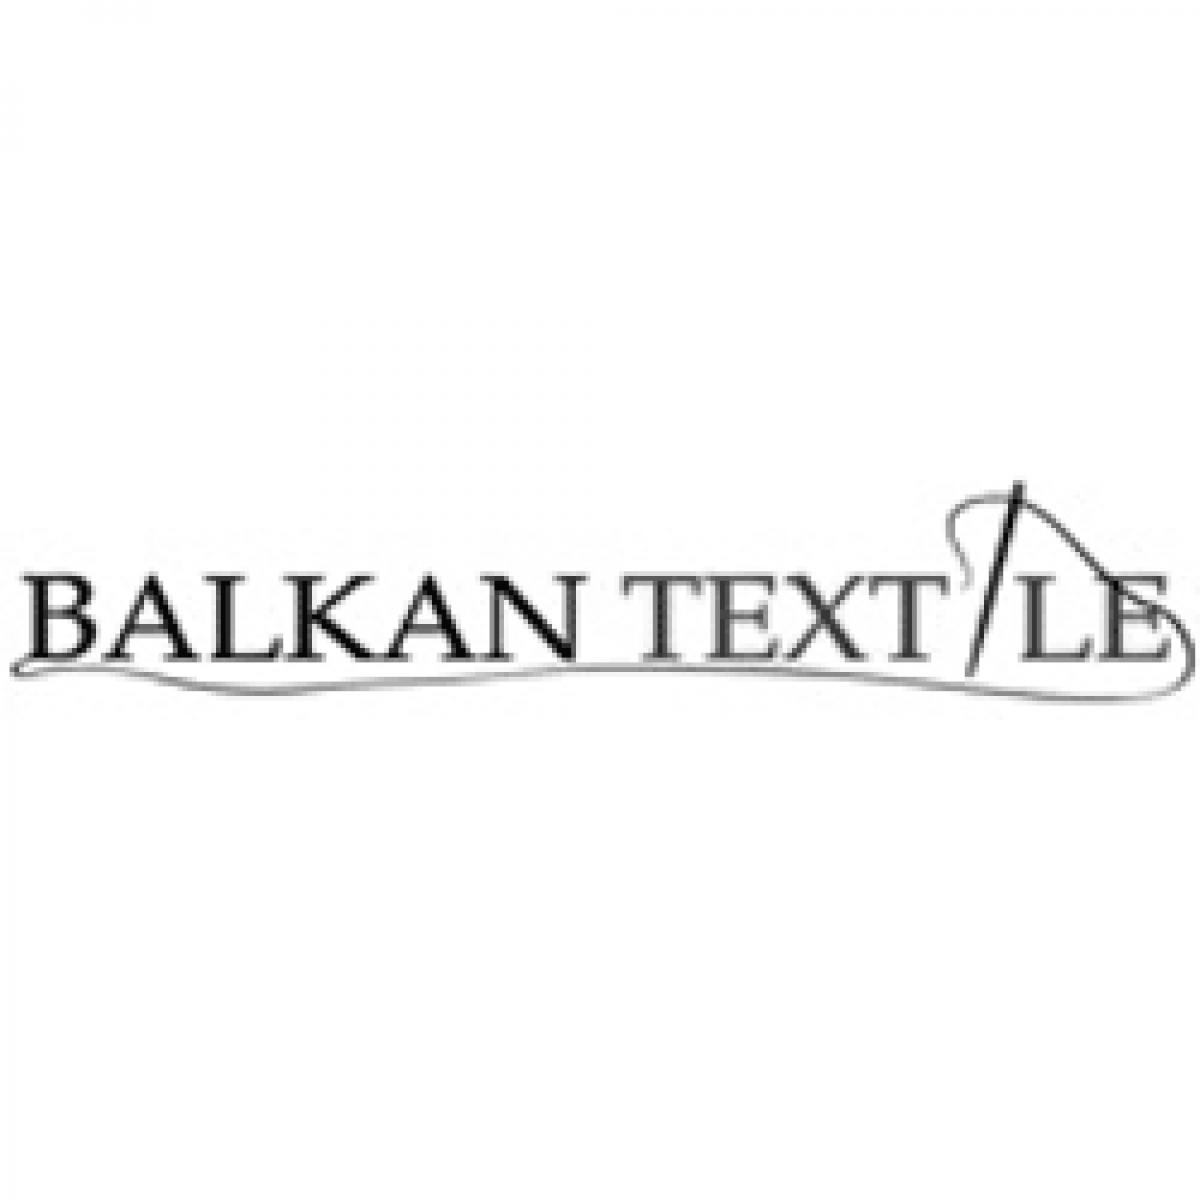 Bilbord za kompaniju Balkan textile